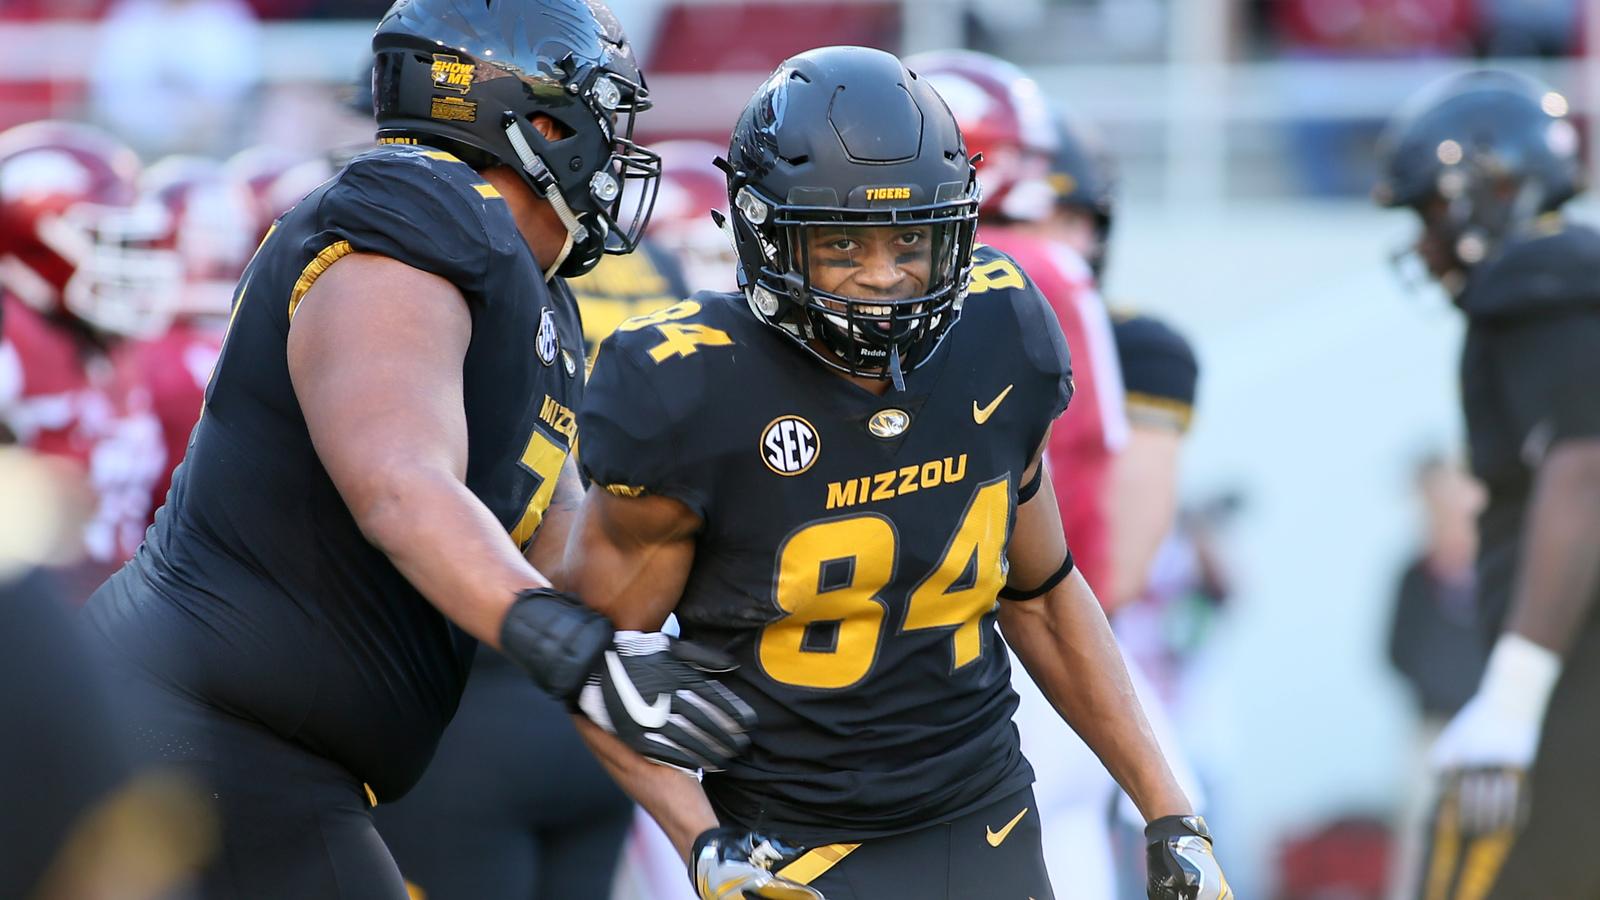 Nick Fitzgerald Injury >> 20 most dangerous college football playmakers entering 2018 season | Yardbarker.com